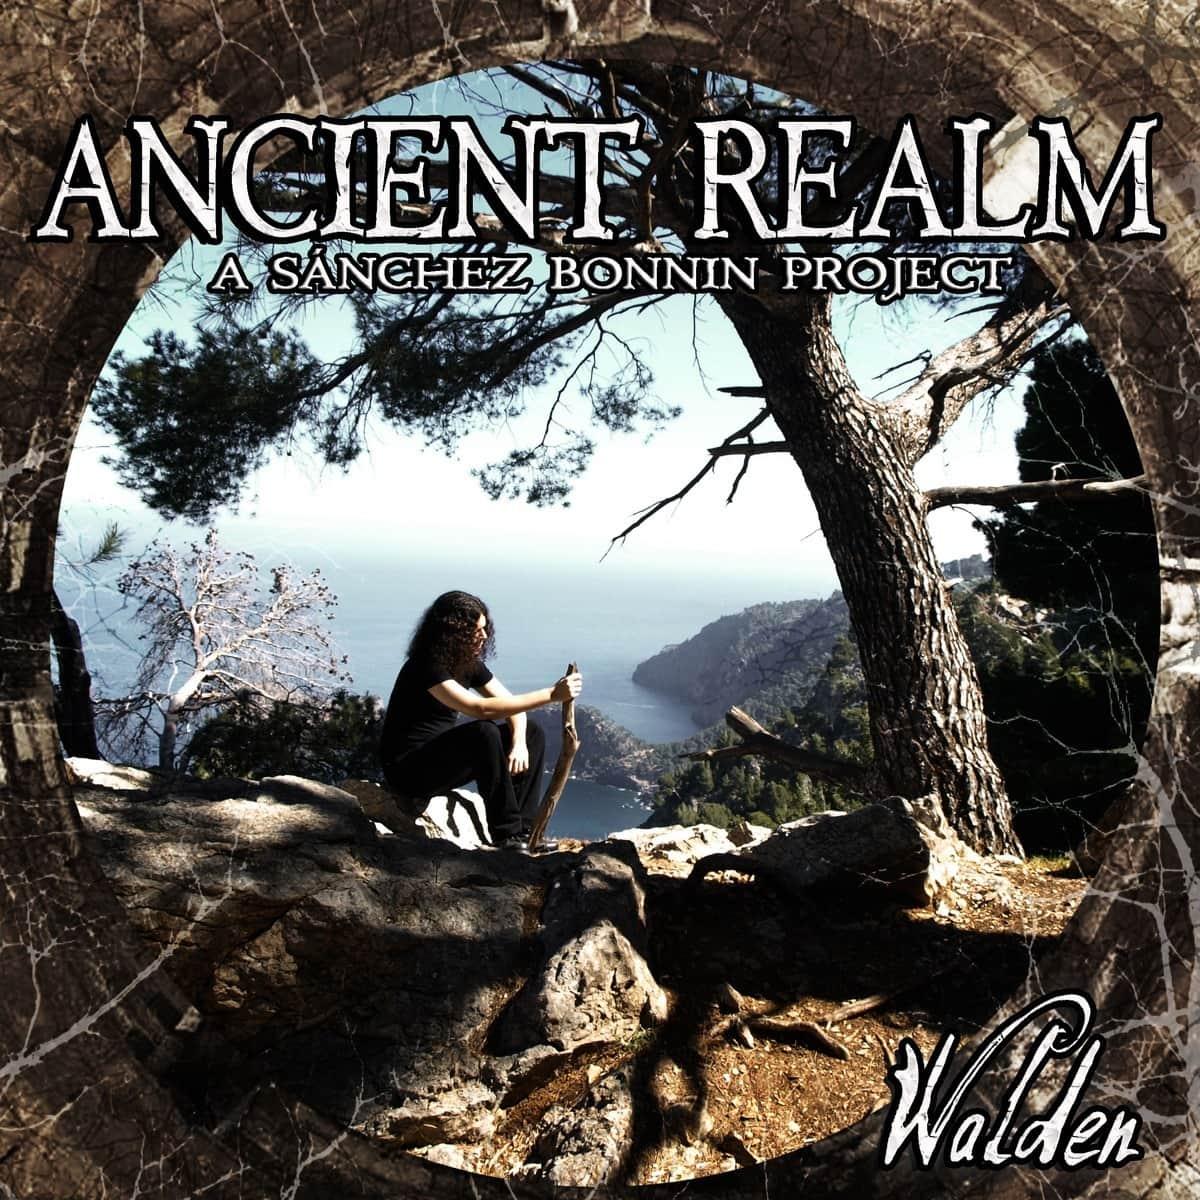 ANCIENT REALM – Walden, 2014